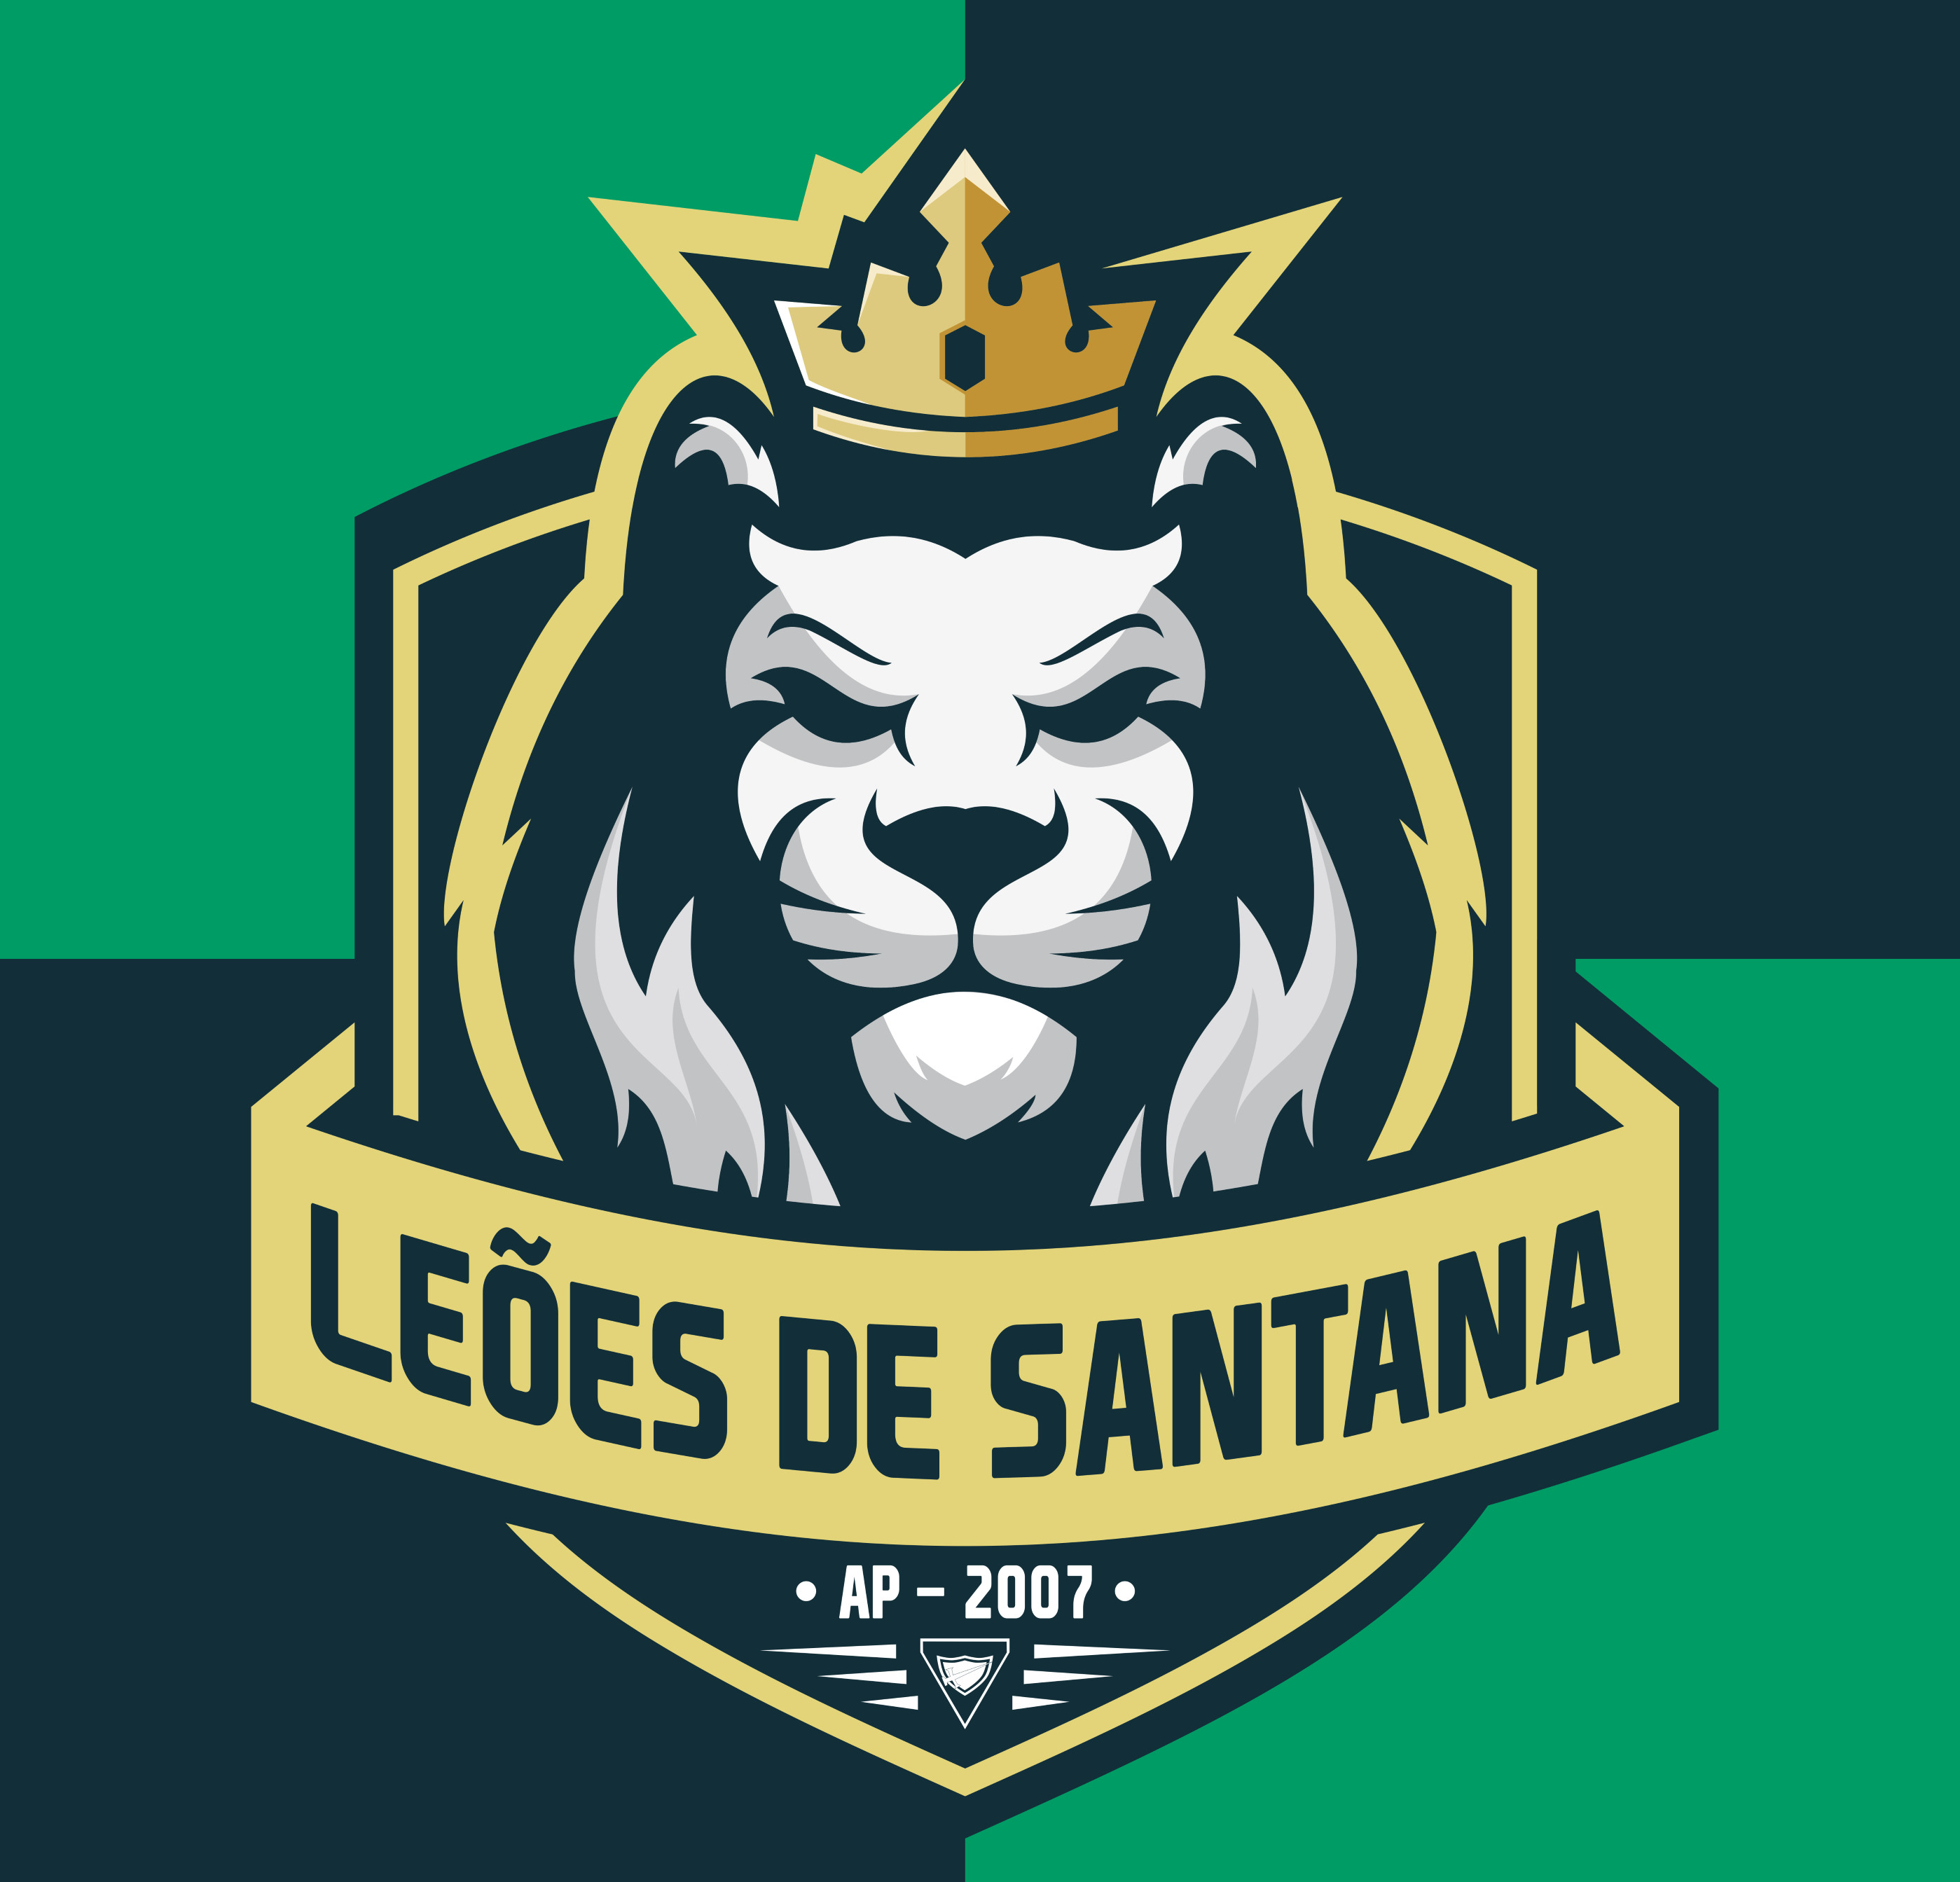 Leões de Santana